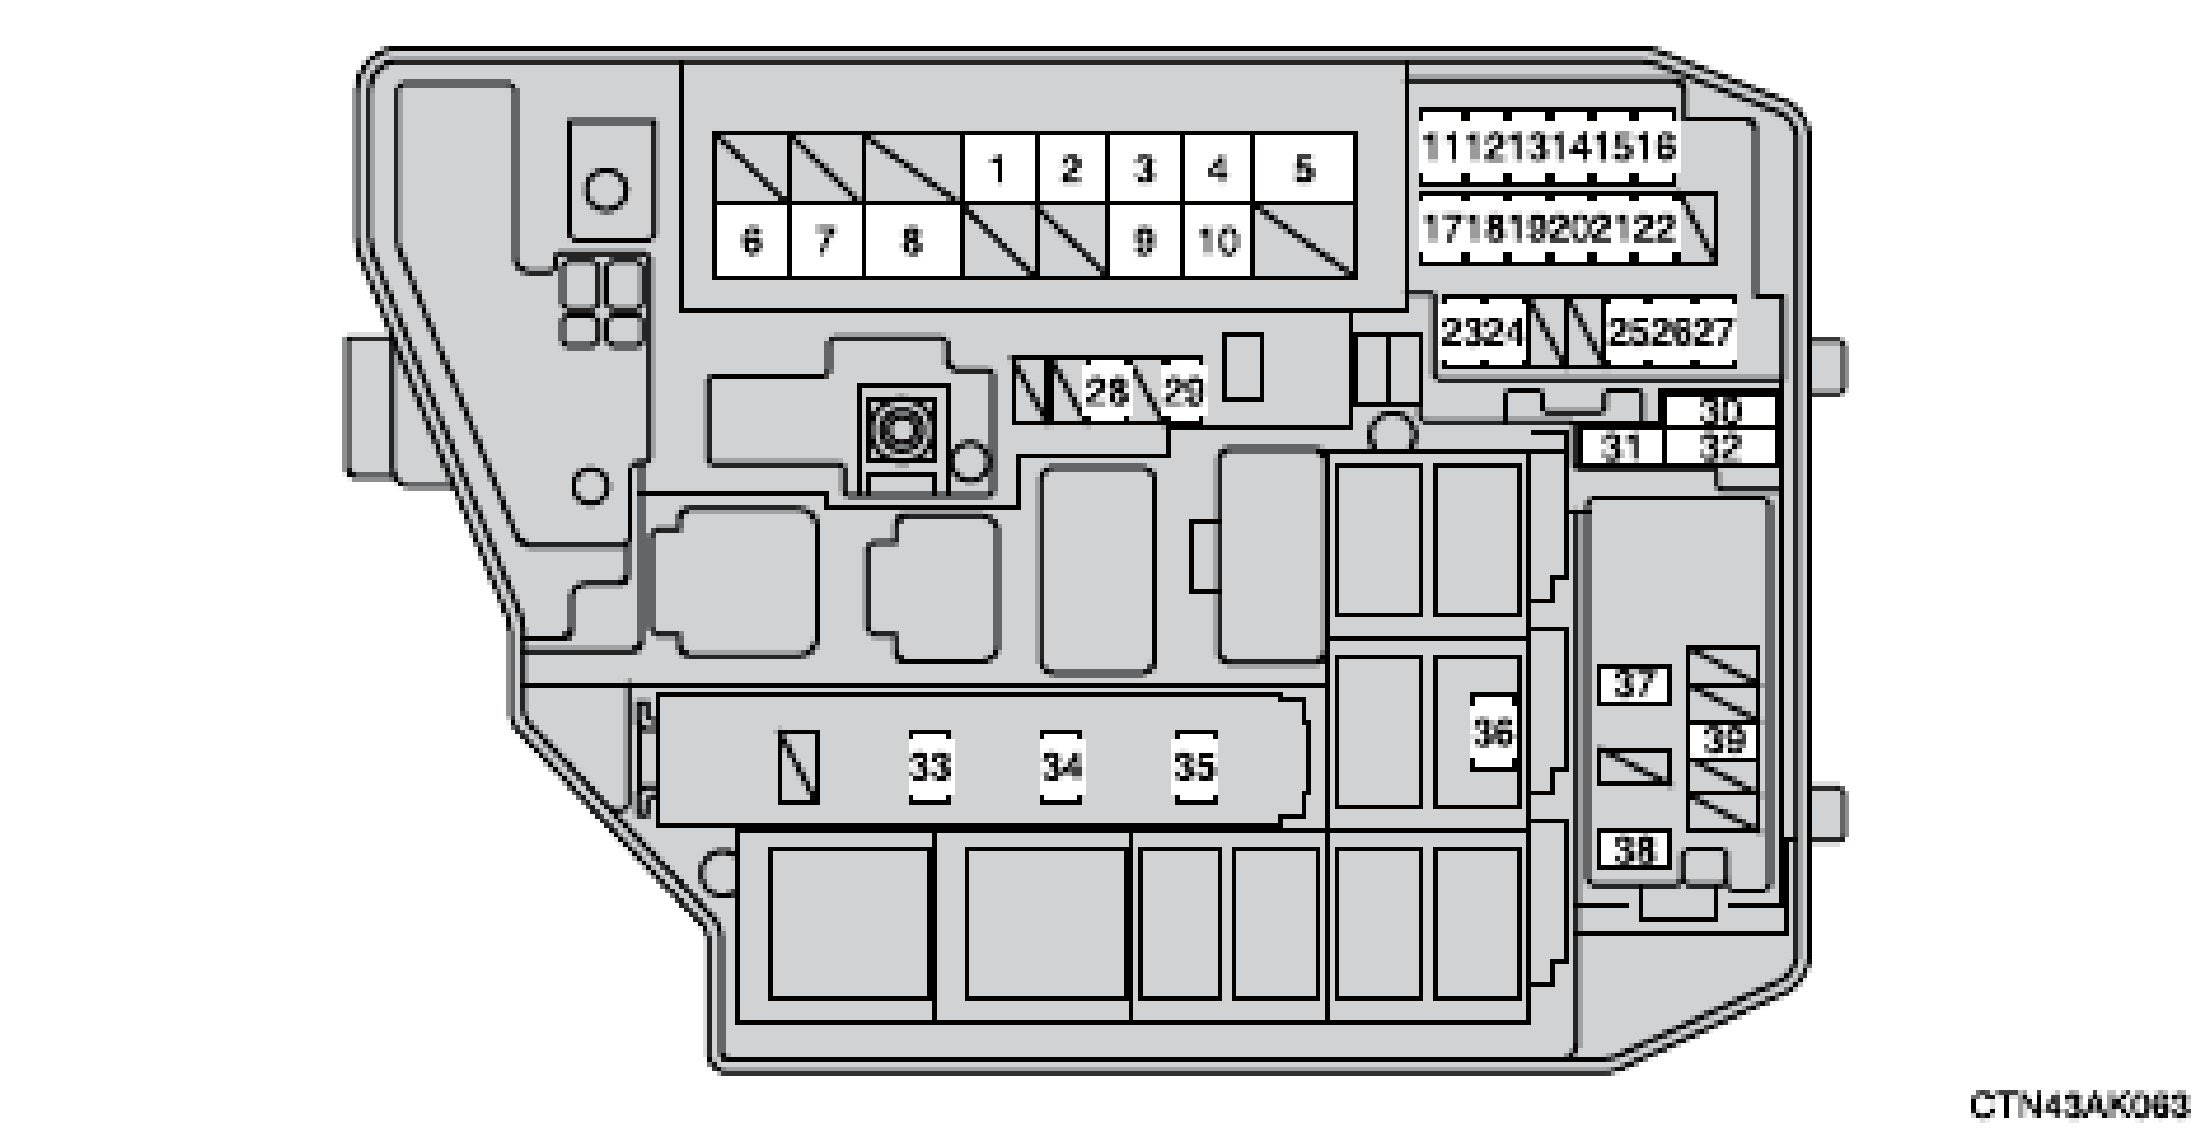 2011 Mustang Engine Diagram - Wiring Diagrams